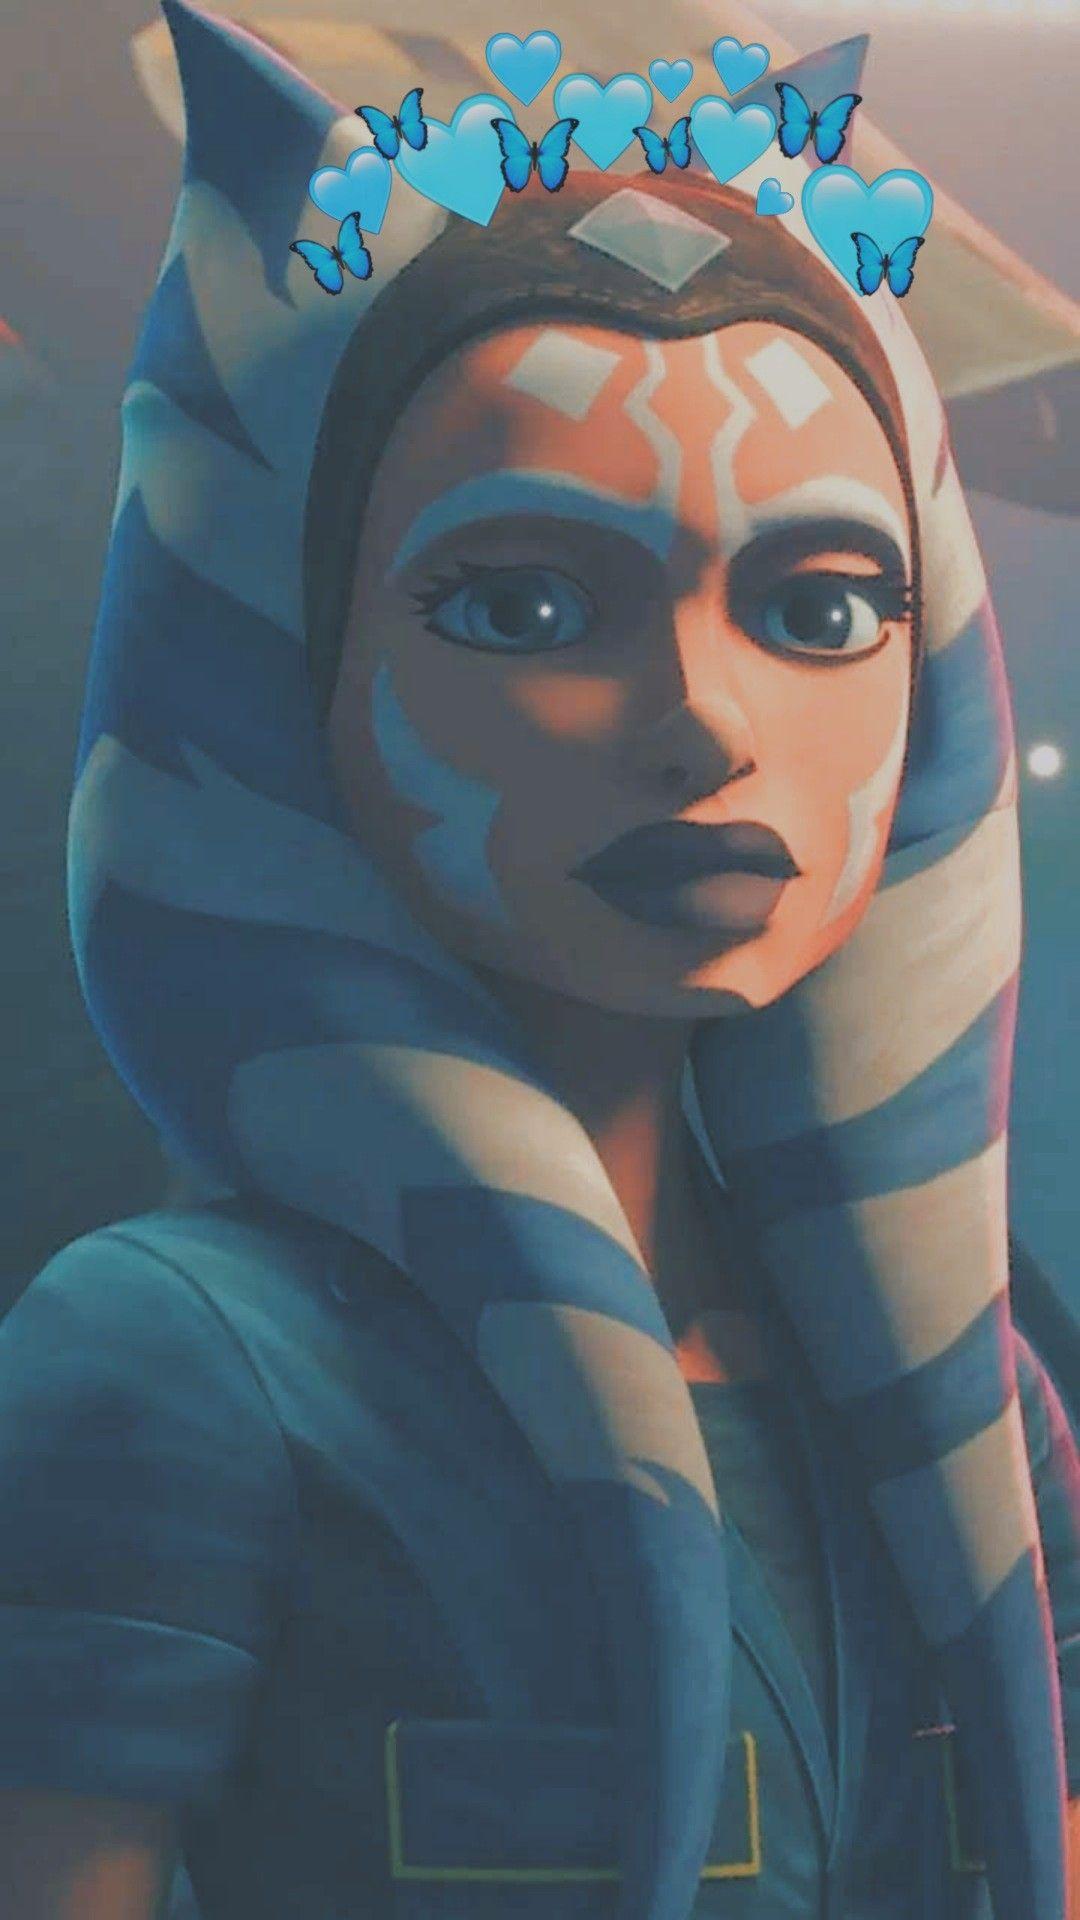 Ahsoka Tano In 2021 Star Wars Drawings Star Wars Art Star Wars Pictures